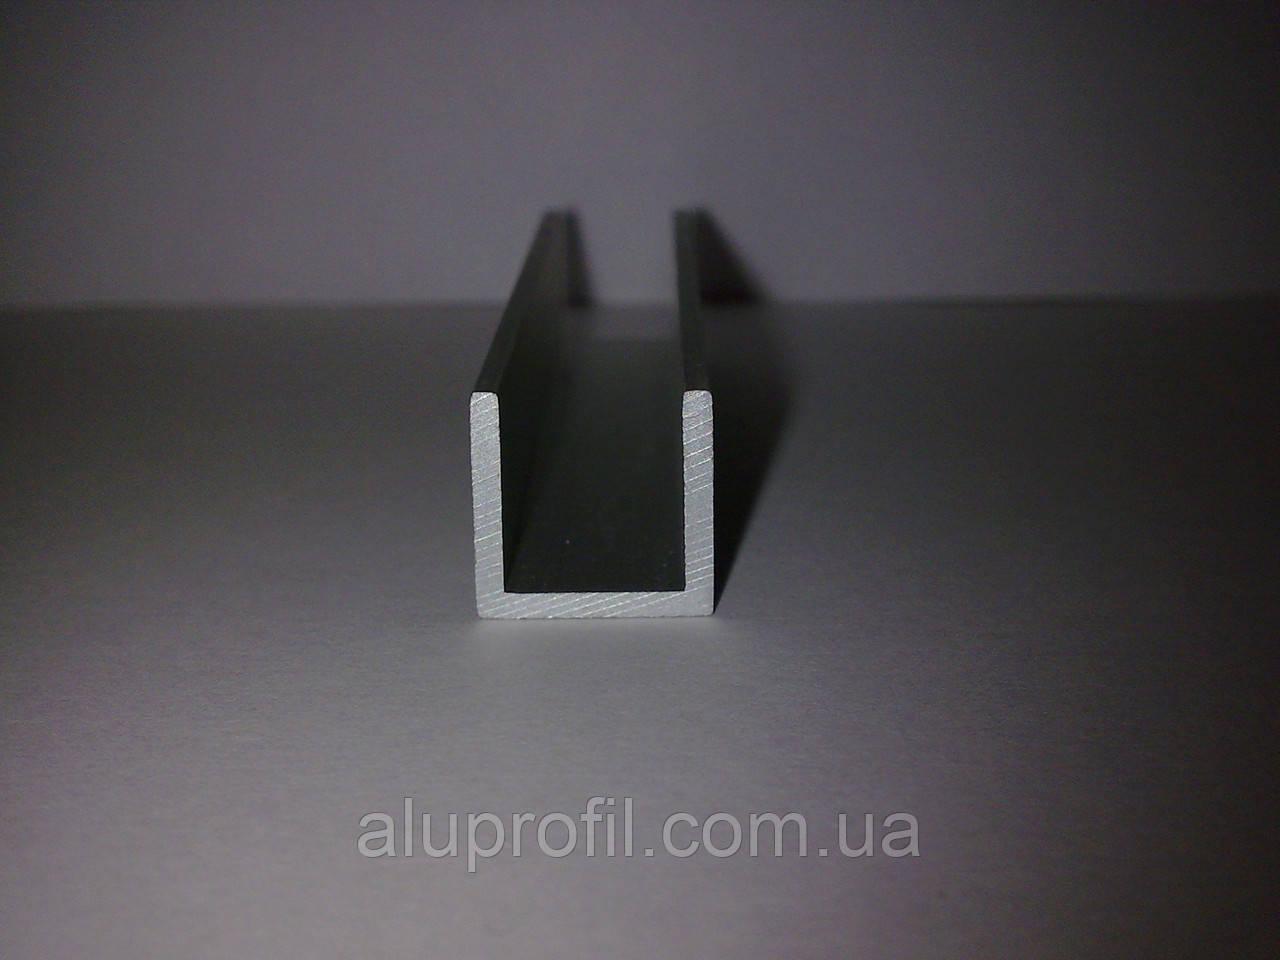 Алюминиевый профиль — п-образный алюминиевый профиль (швеллер) 15х10x1,5 AS